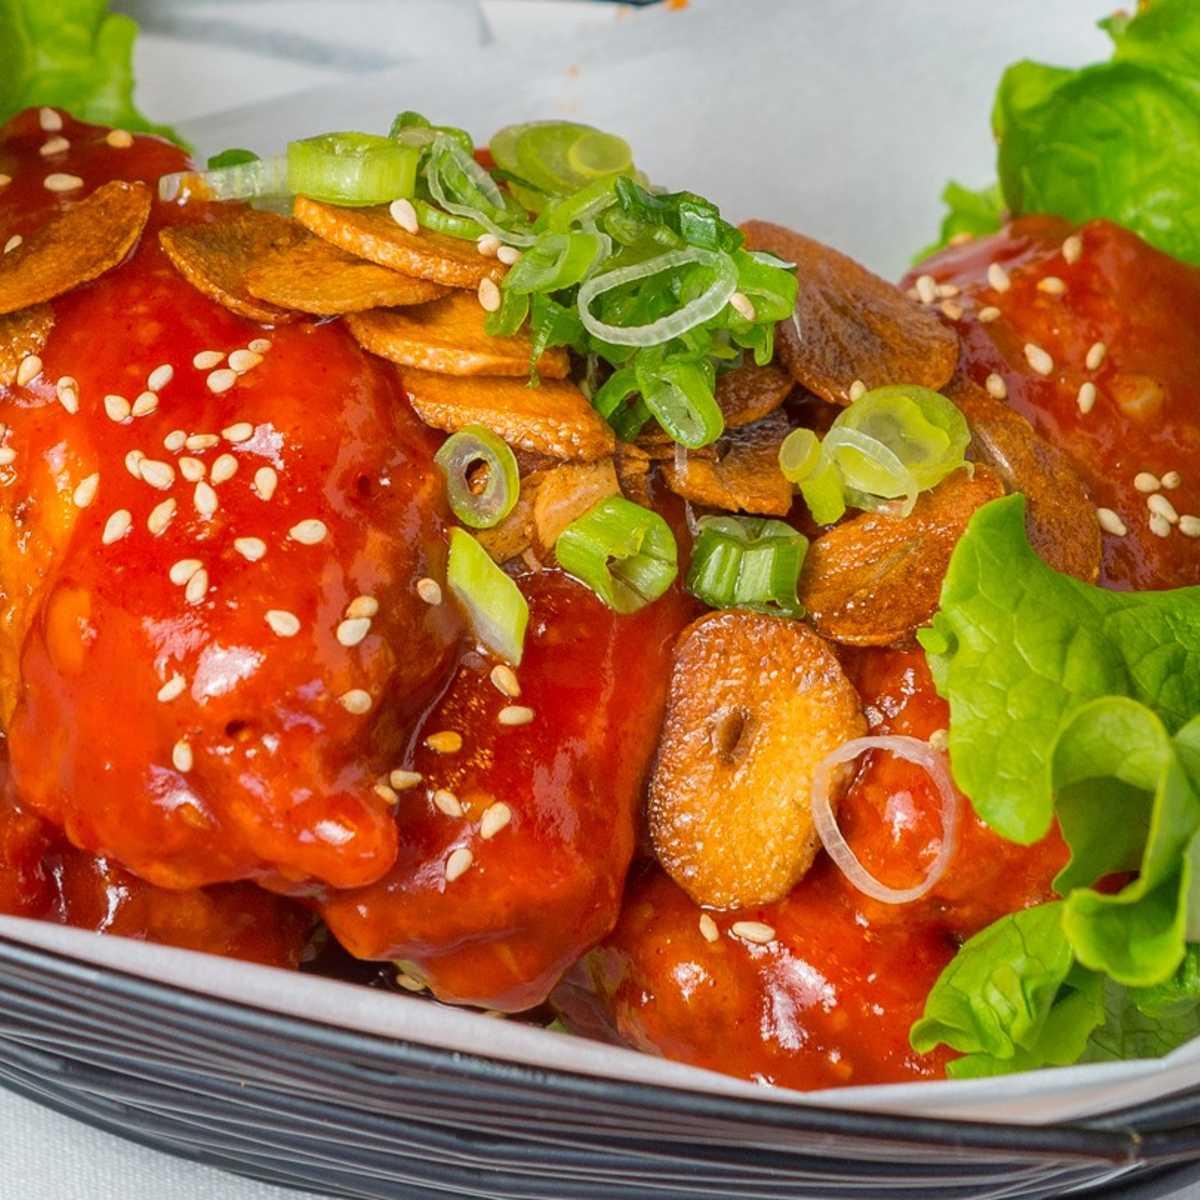 Babbi Babbi Korean Kitchen Delivery Takeout 8015 Turkey Lake Road Orlando Menu Prices Doordash